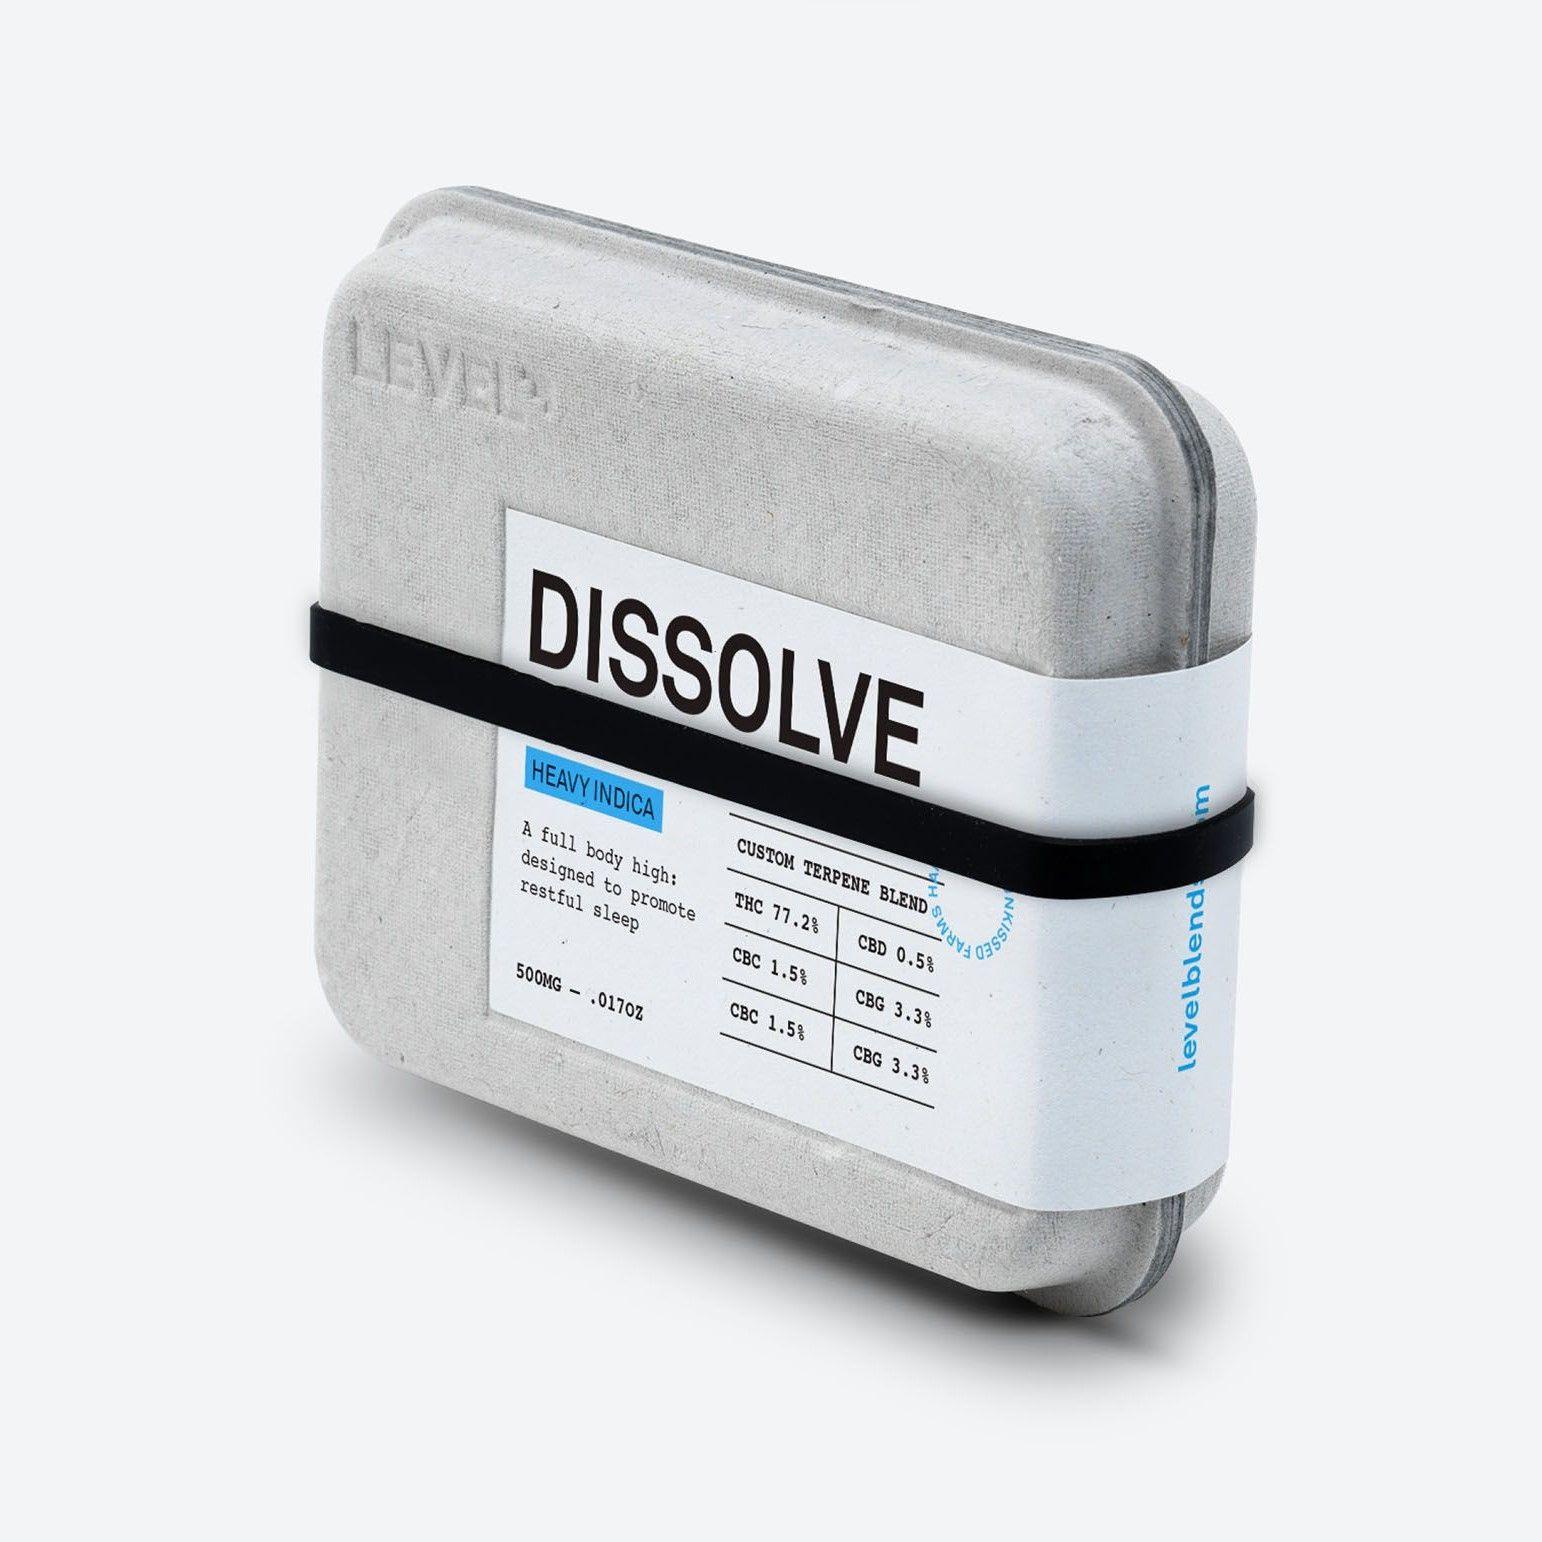 Level Dissolve Cartridge Heavy Indica $42